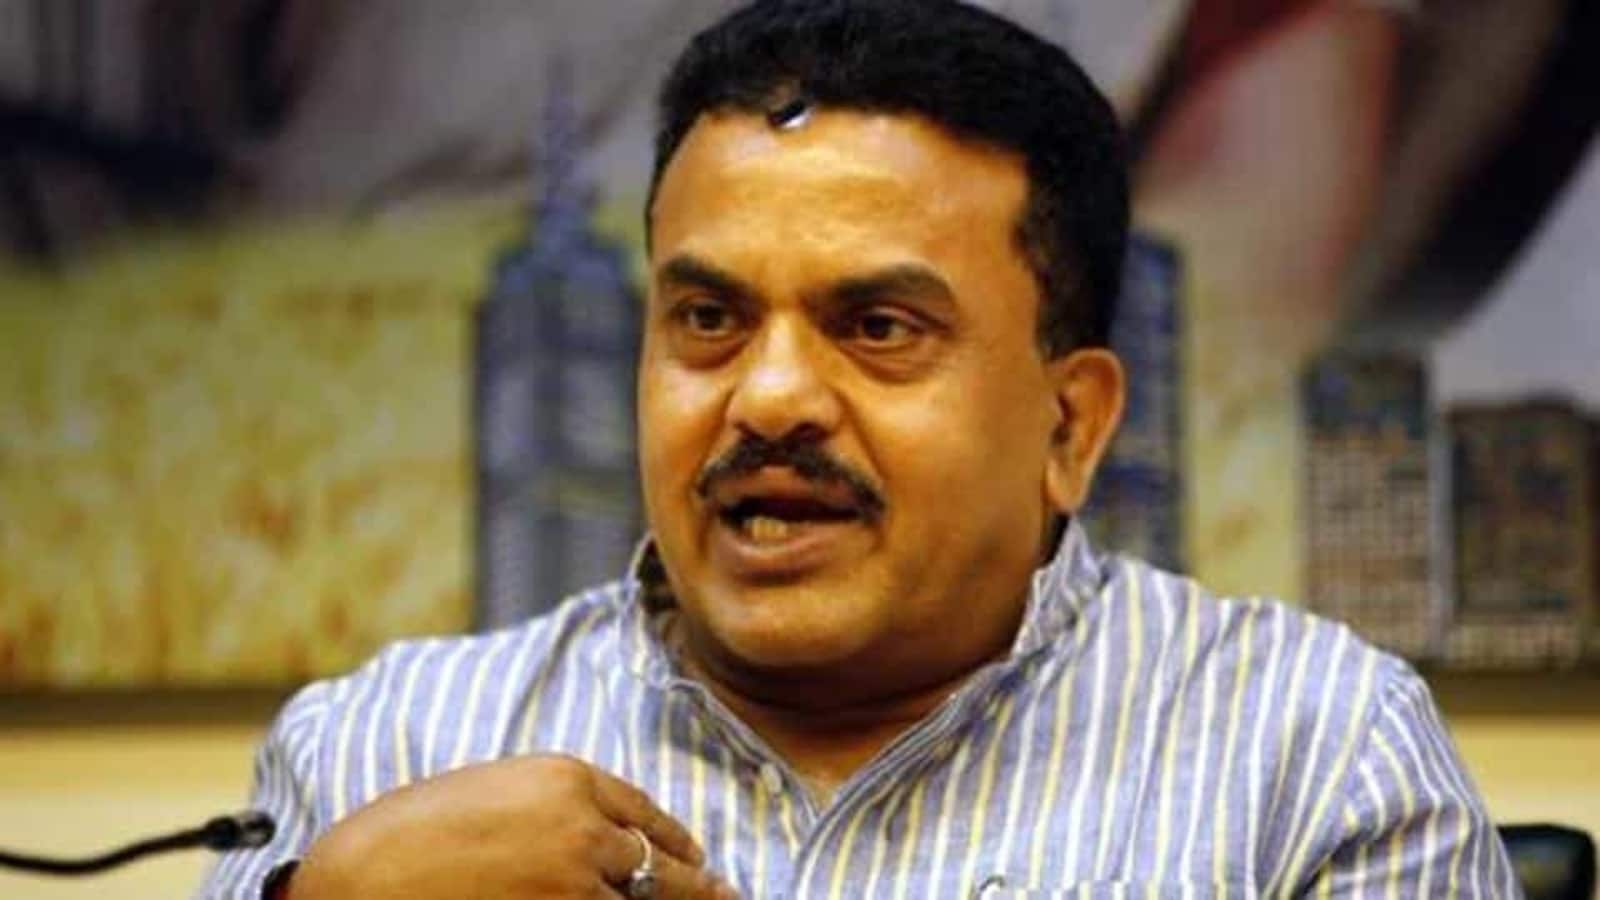 Congress must take stand on Param Bir's claim, says former MP Sanjay Nirupam